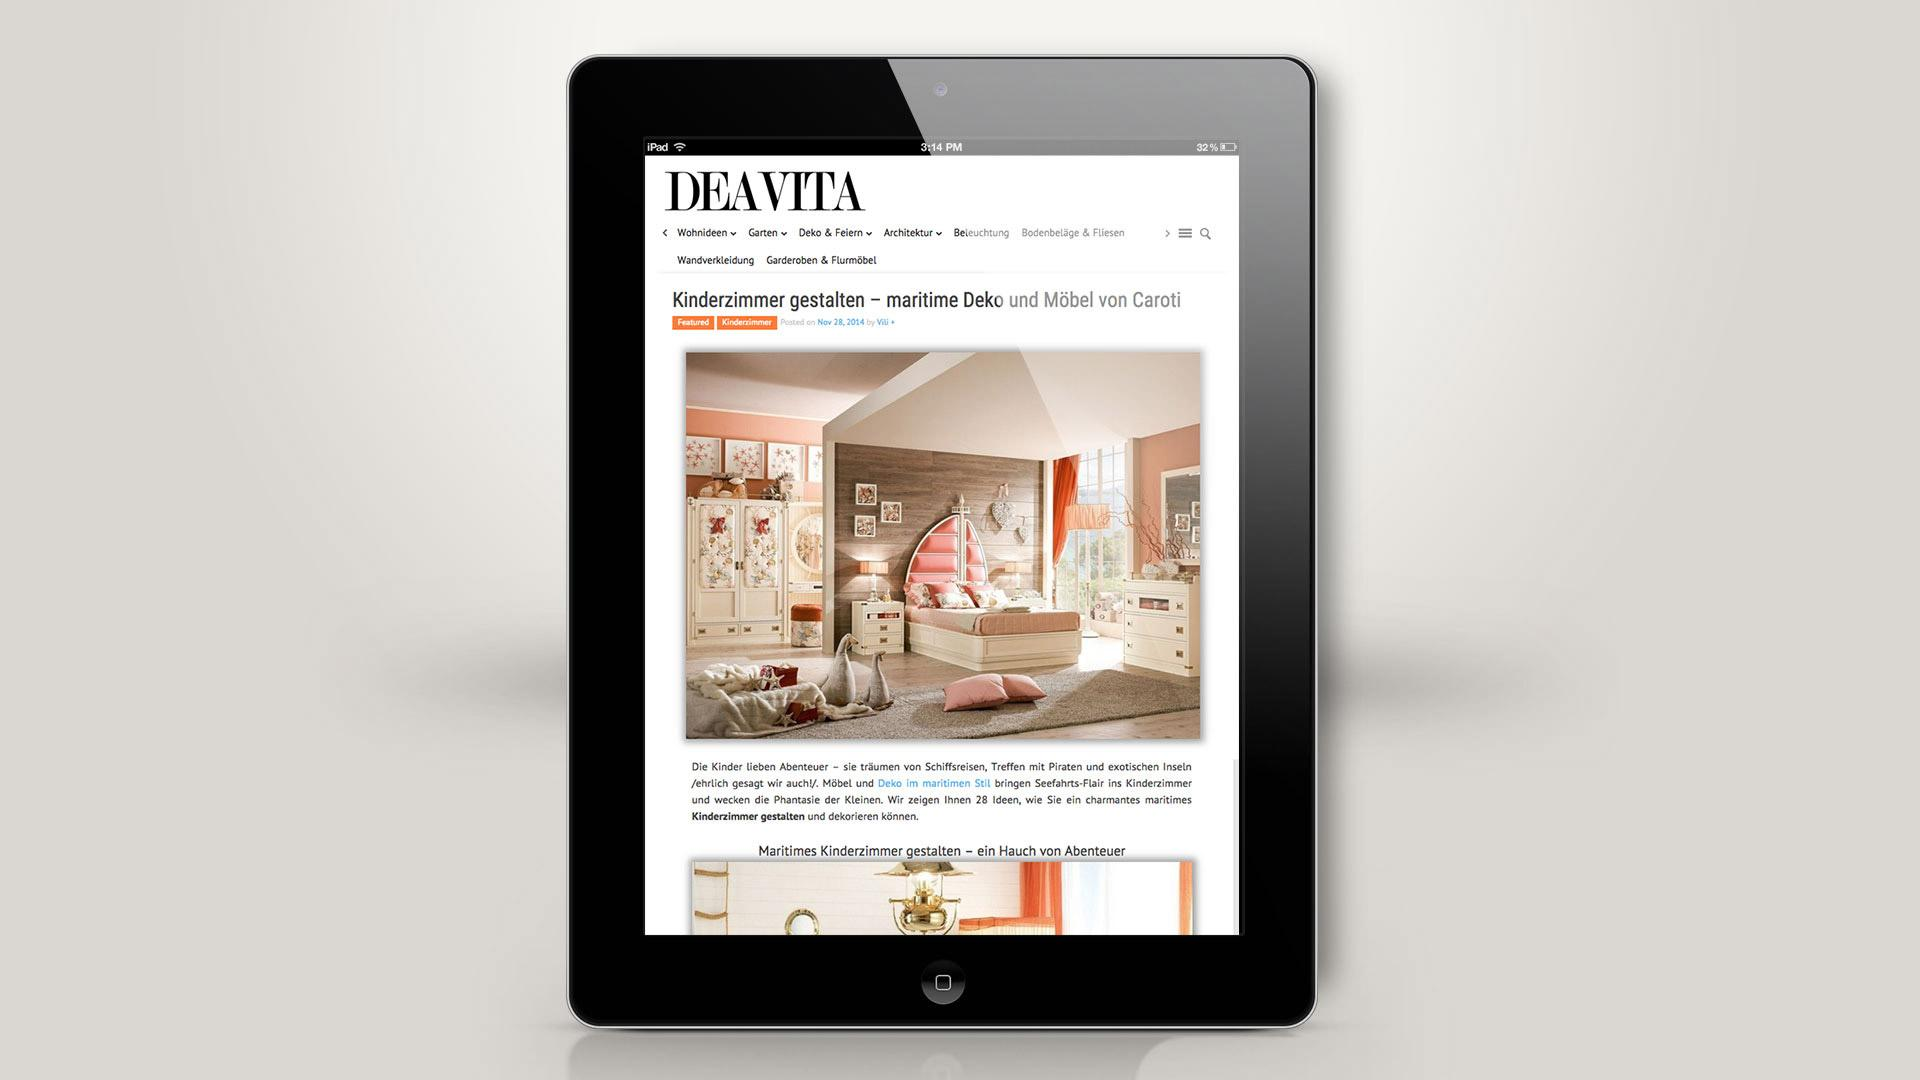 News about nautical style furnitures - Caroti